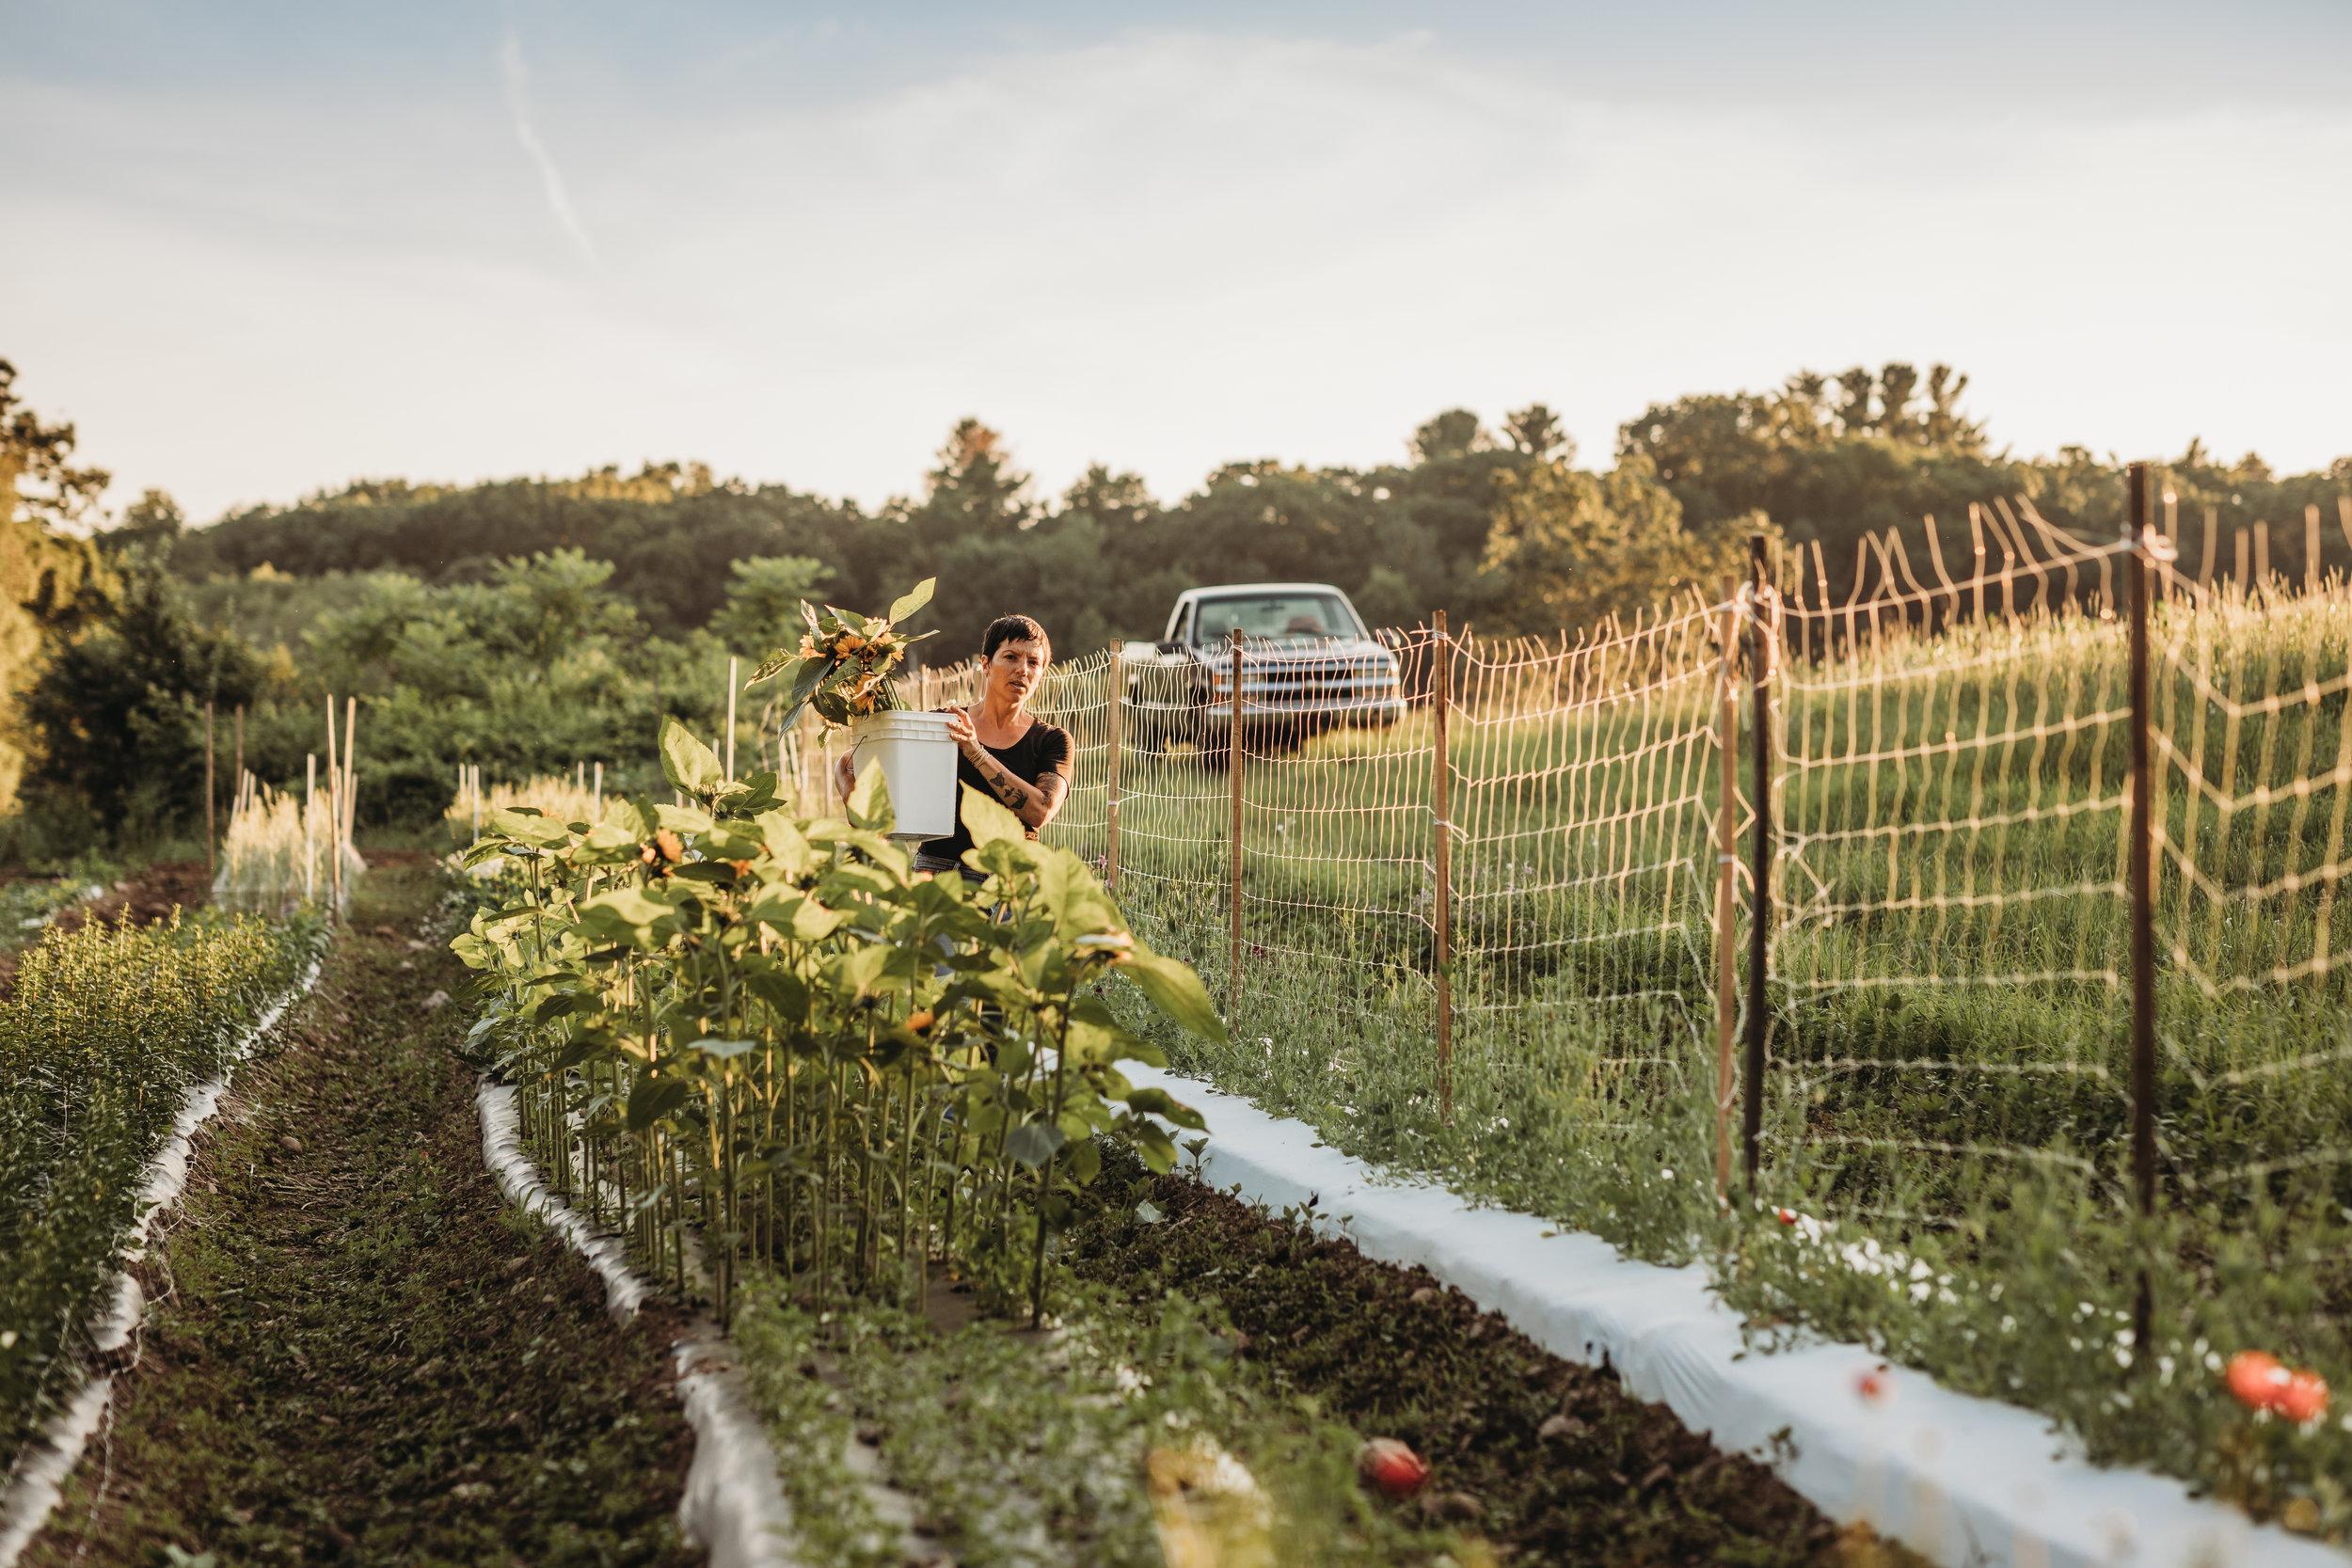 field-edge-flowers-boston-lifestyle-branding-photographer-joy-leduc-3.jpg